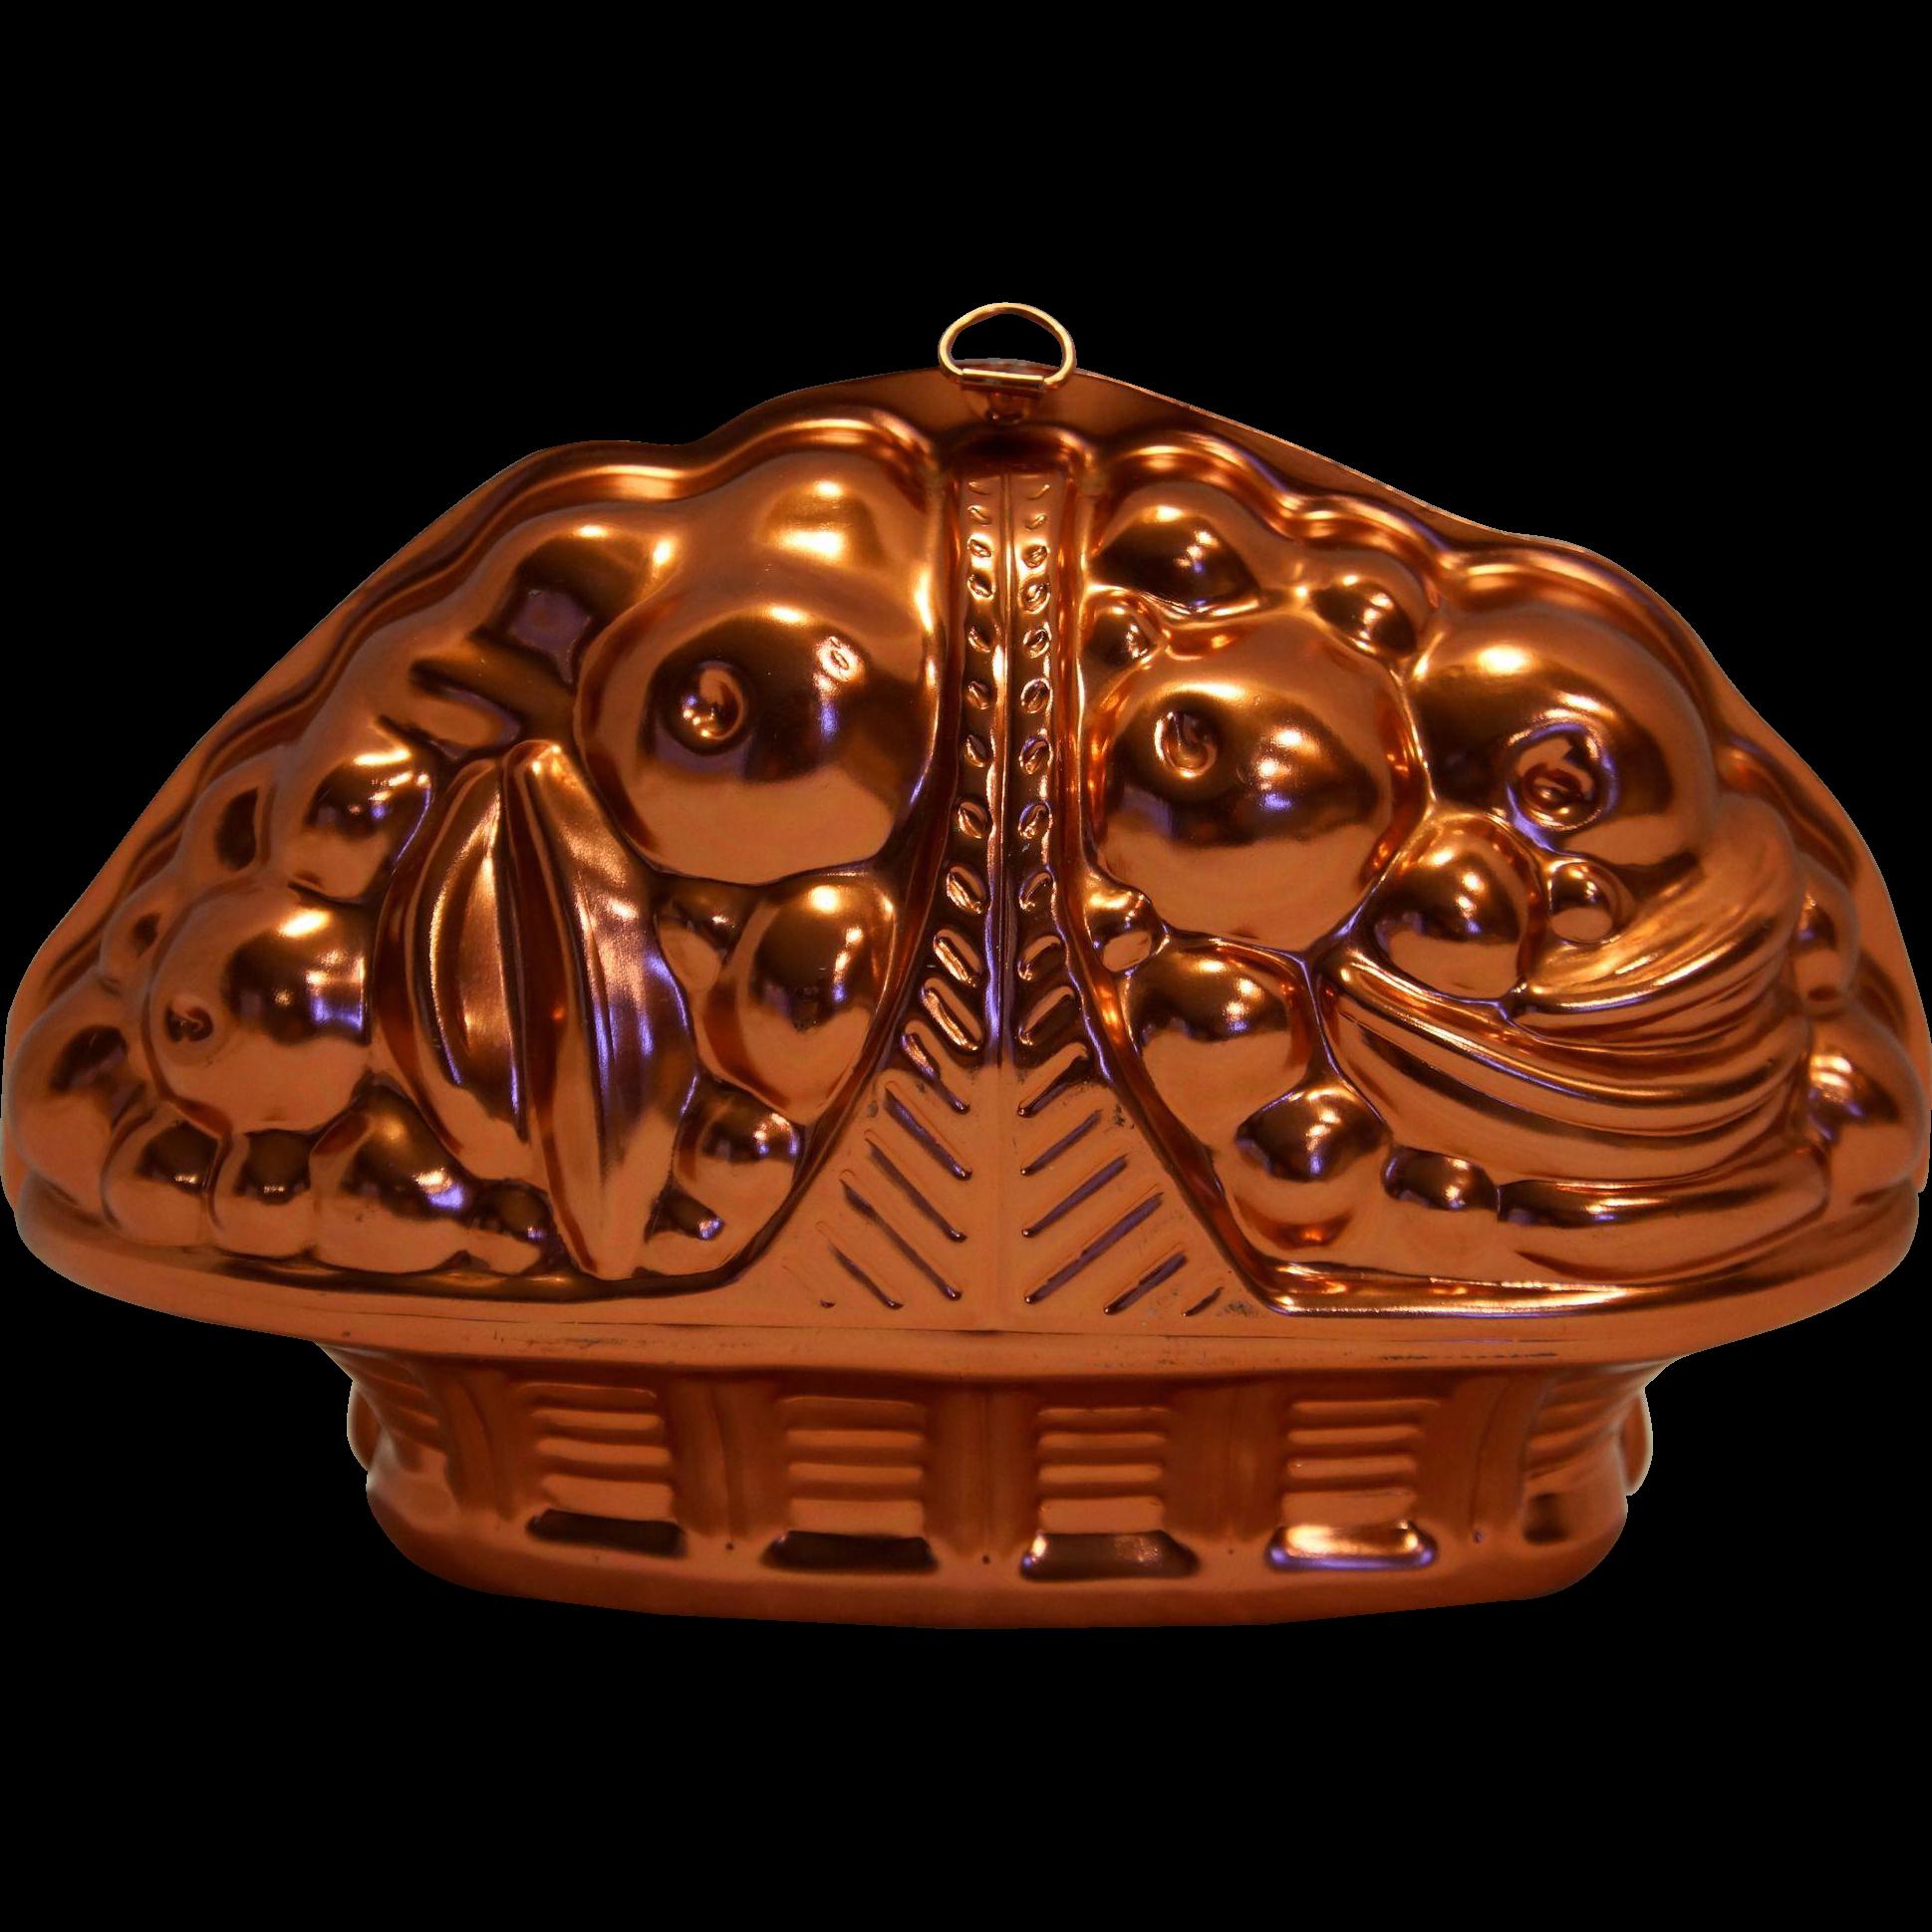 Mirro Pink Aluminum Copper Tone Fruit Basket Jello Mold Pan